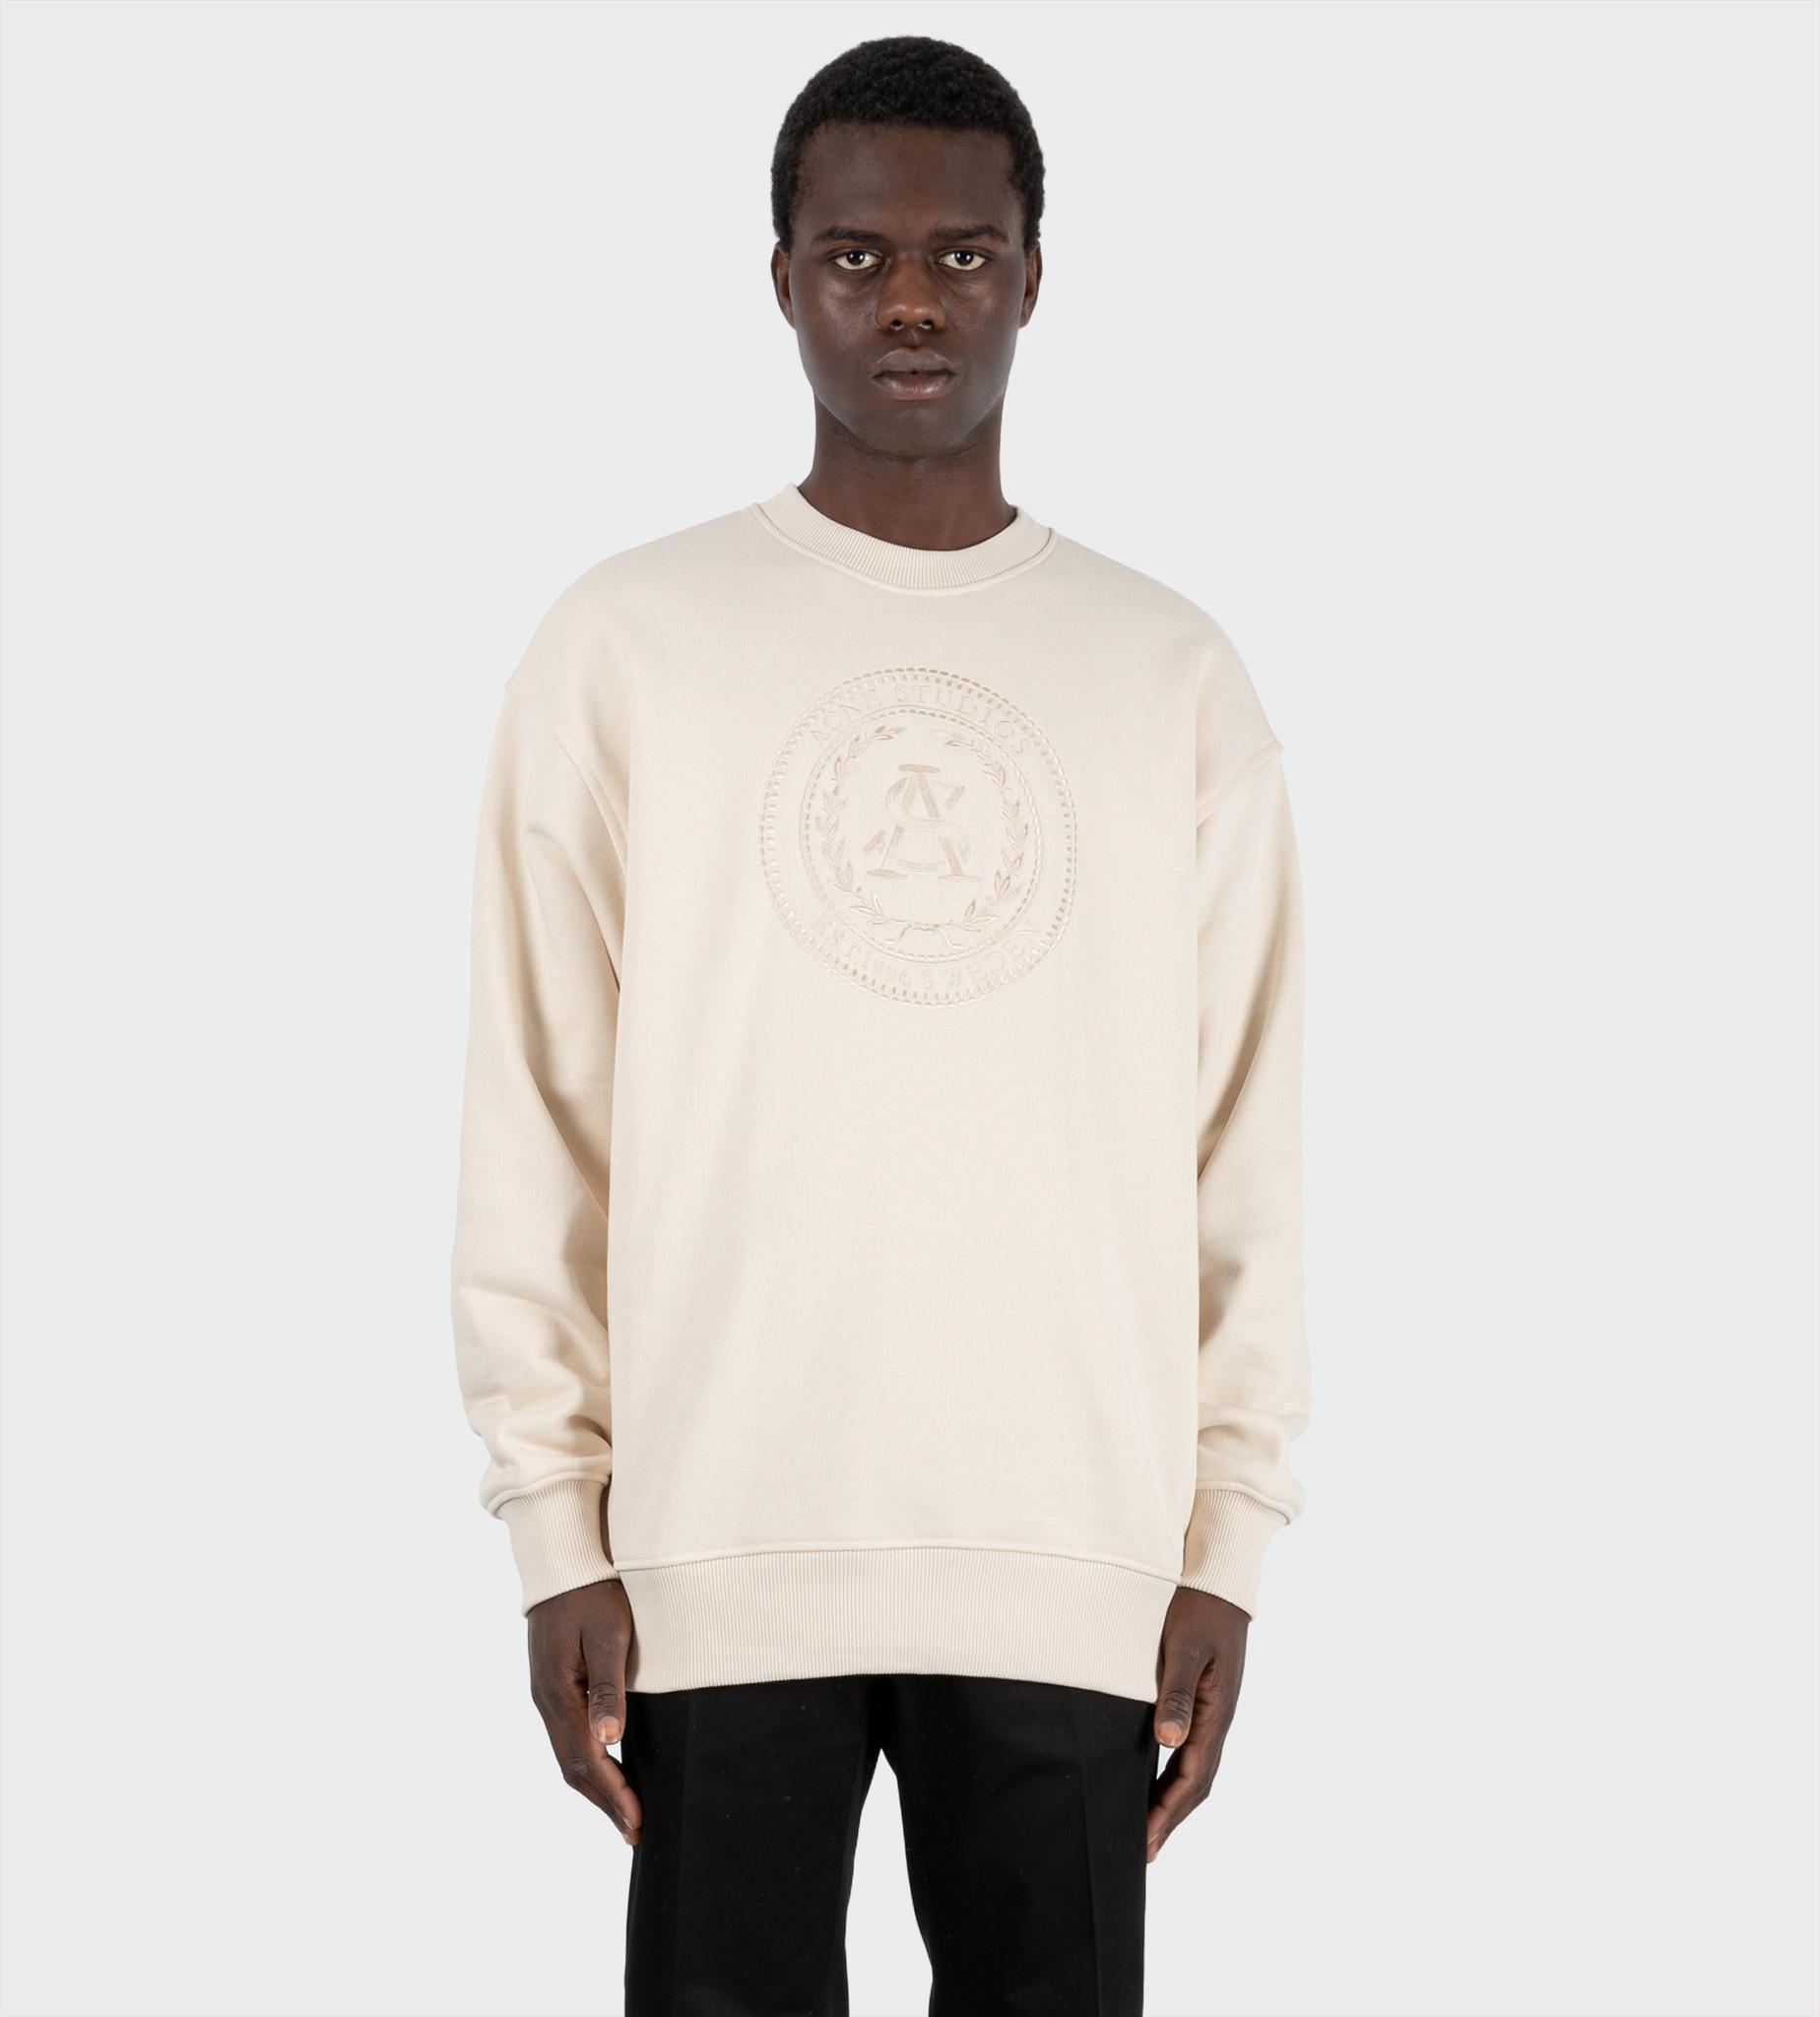 ACNE STUDIOS Oversized Sweatshirt Coconut White